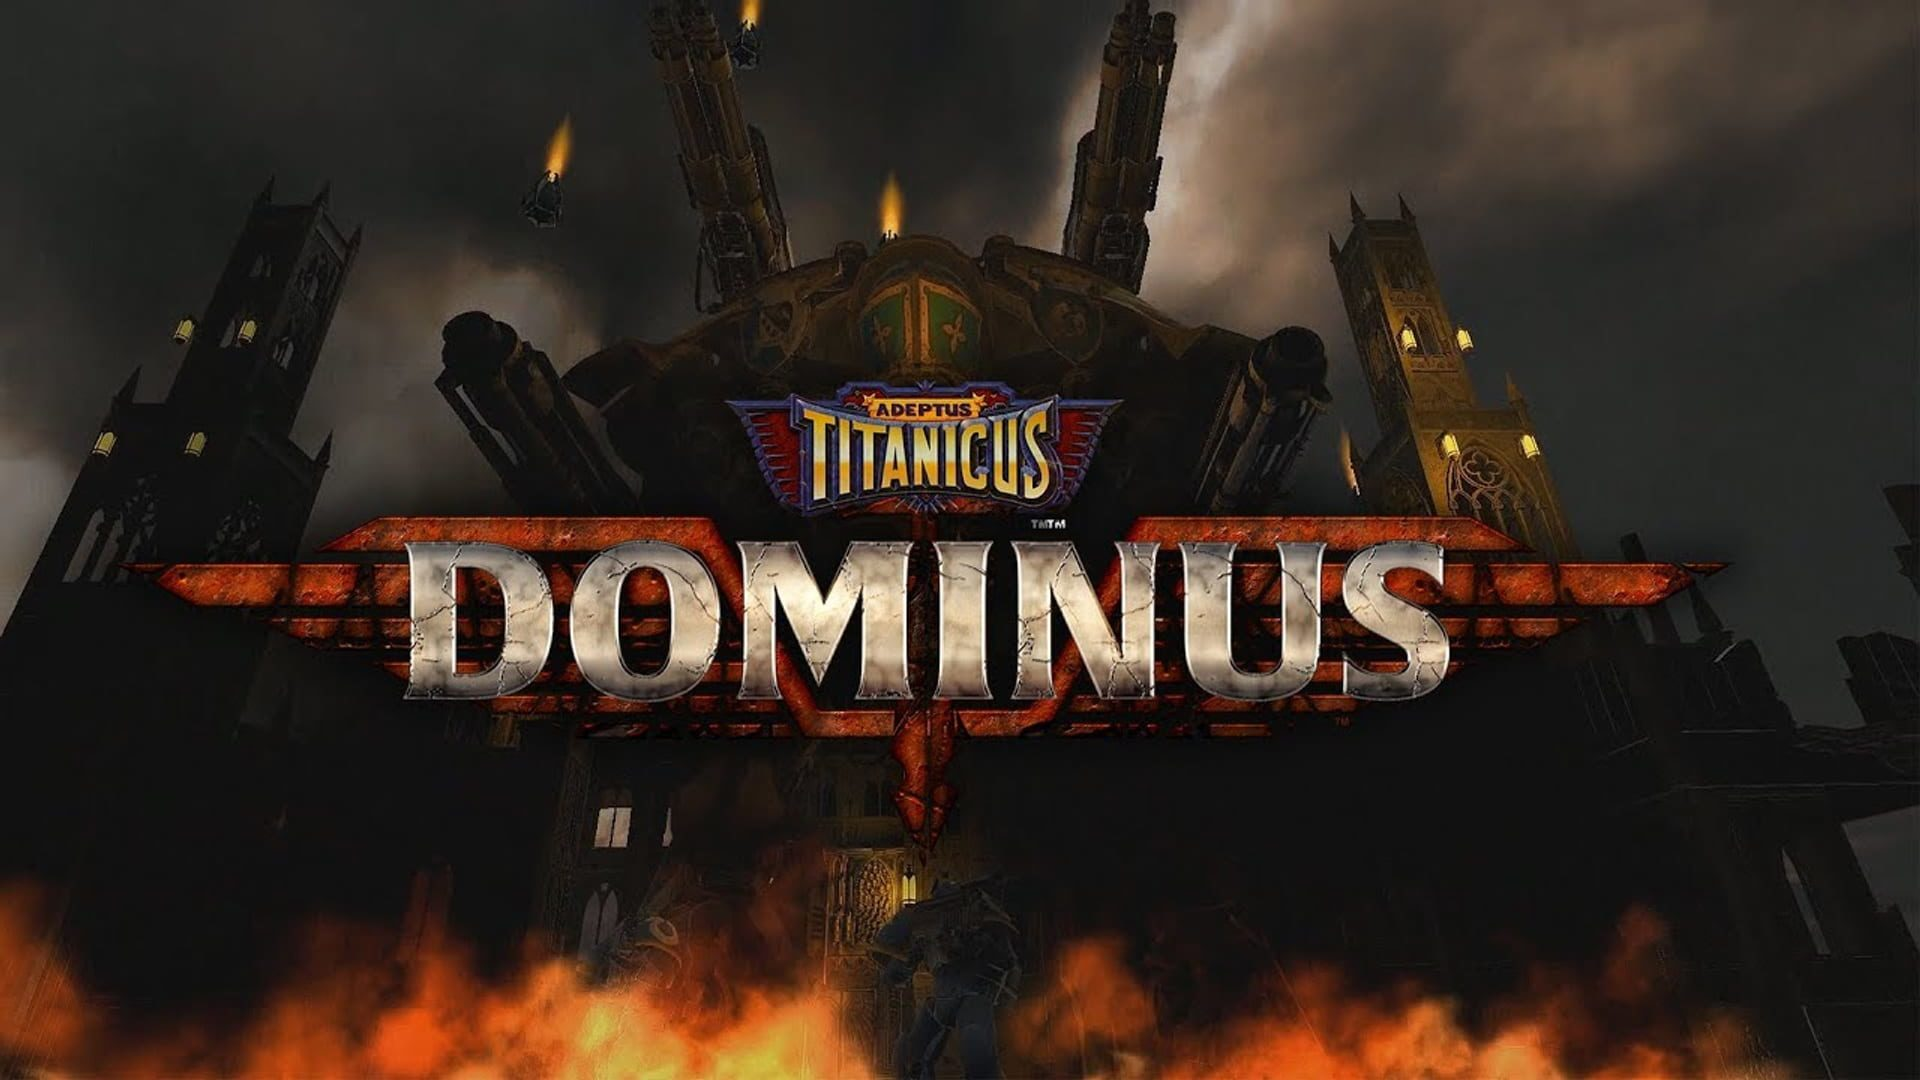 buy Adeptus Titanicus: Dominus cd key for pc platform